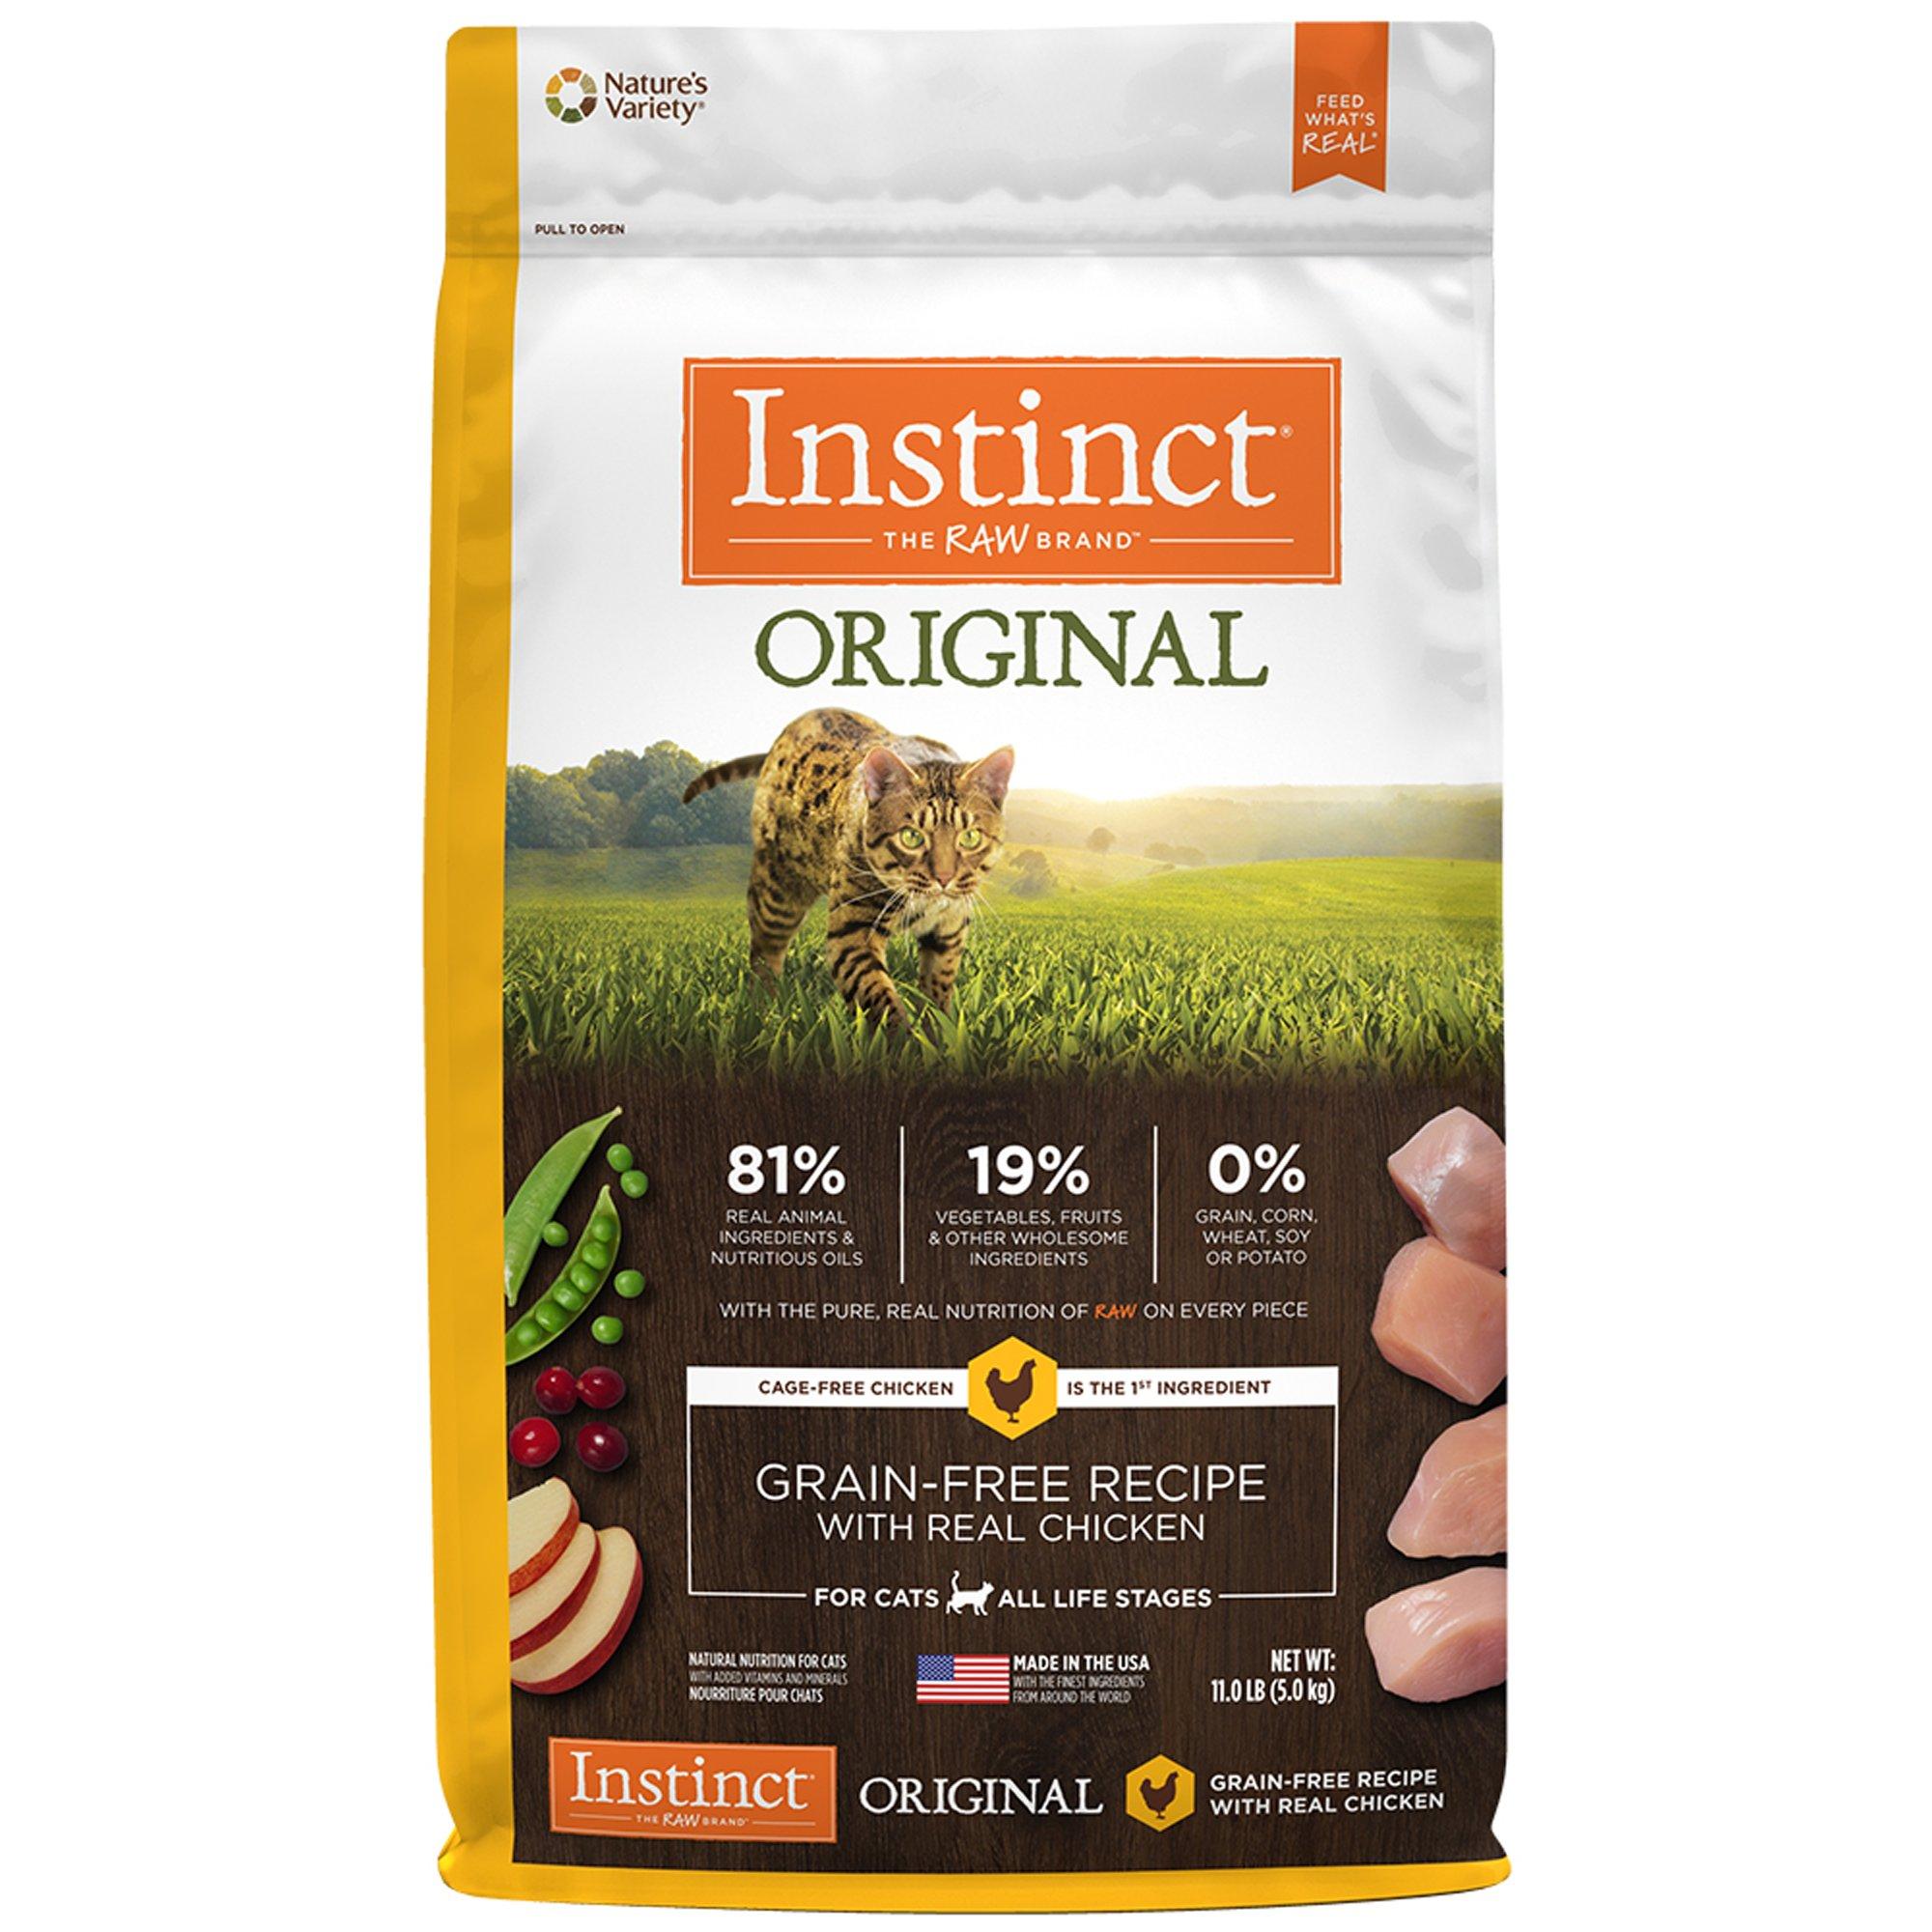 Instinct Original Grain Free Recipe With Real Chicken Natural Dry